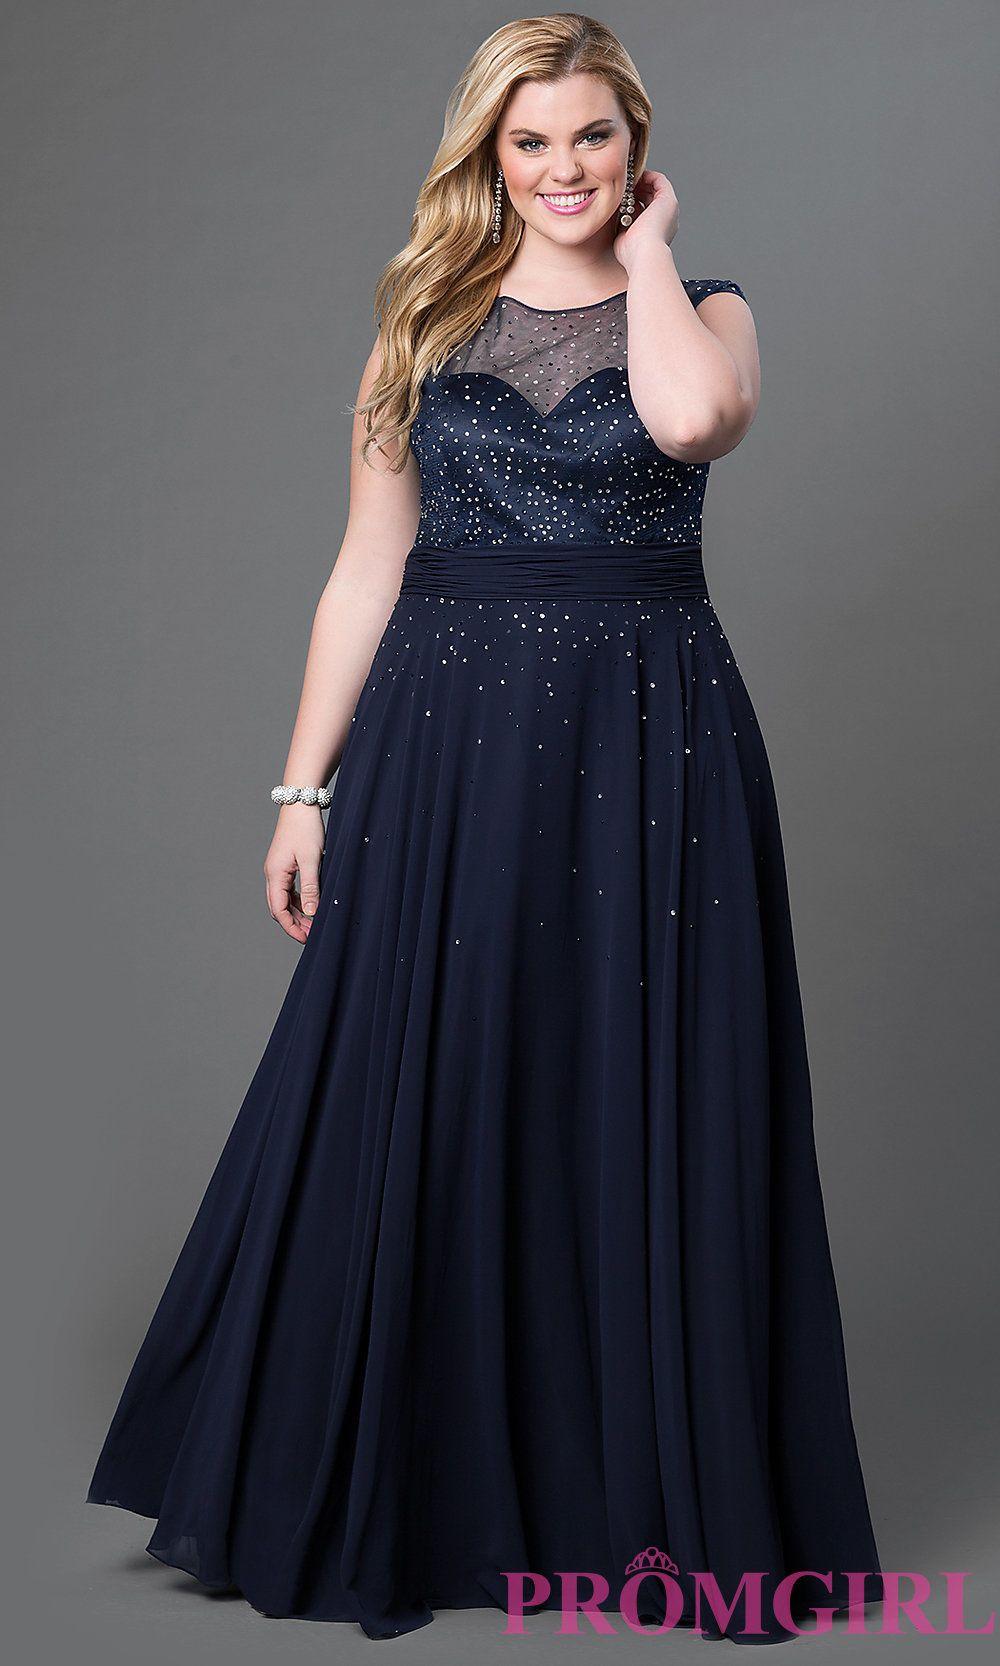 Prom Dresses Celebrity Dresses Sexy Evening Gowns Sc Sc7170